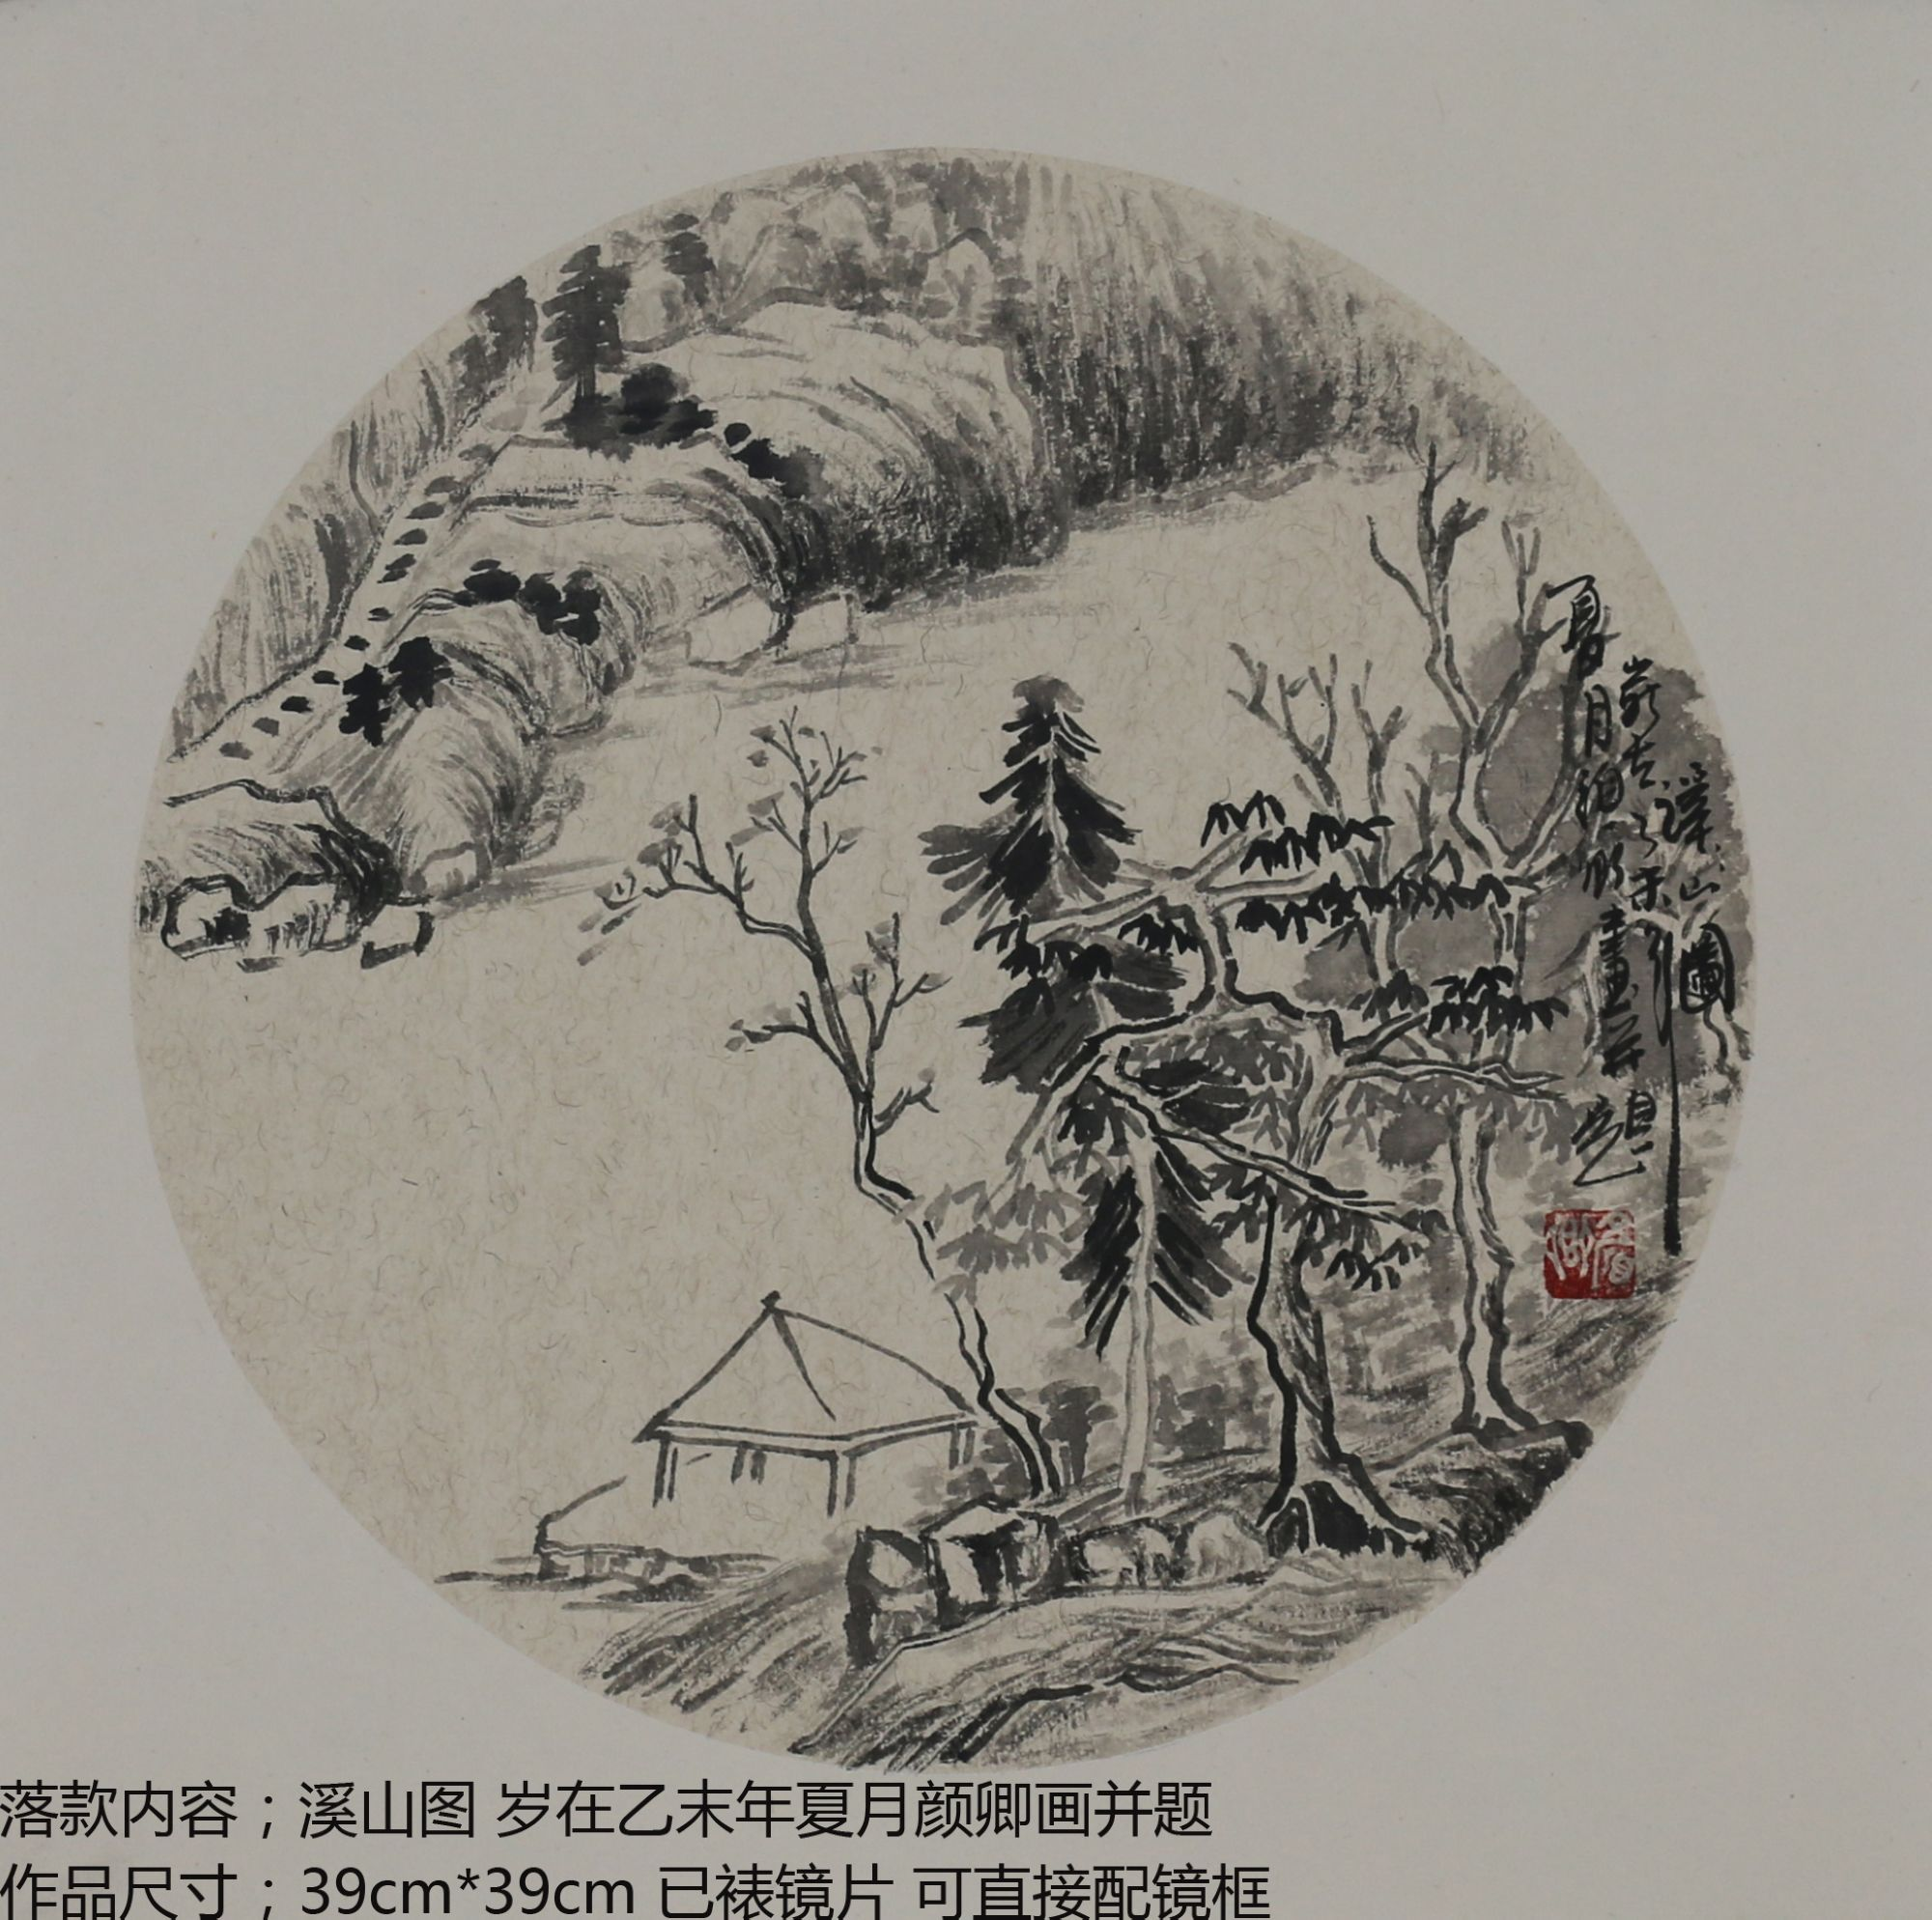 Китайская живопись Артикул 575298437207